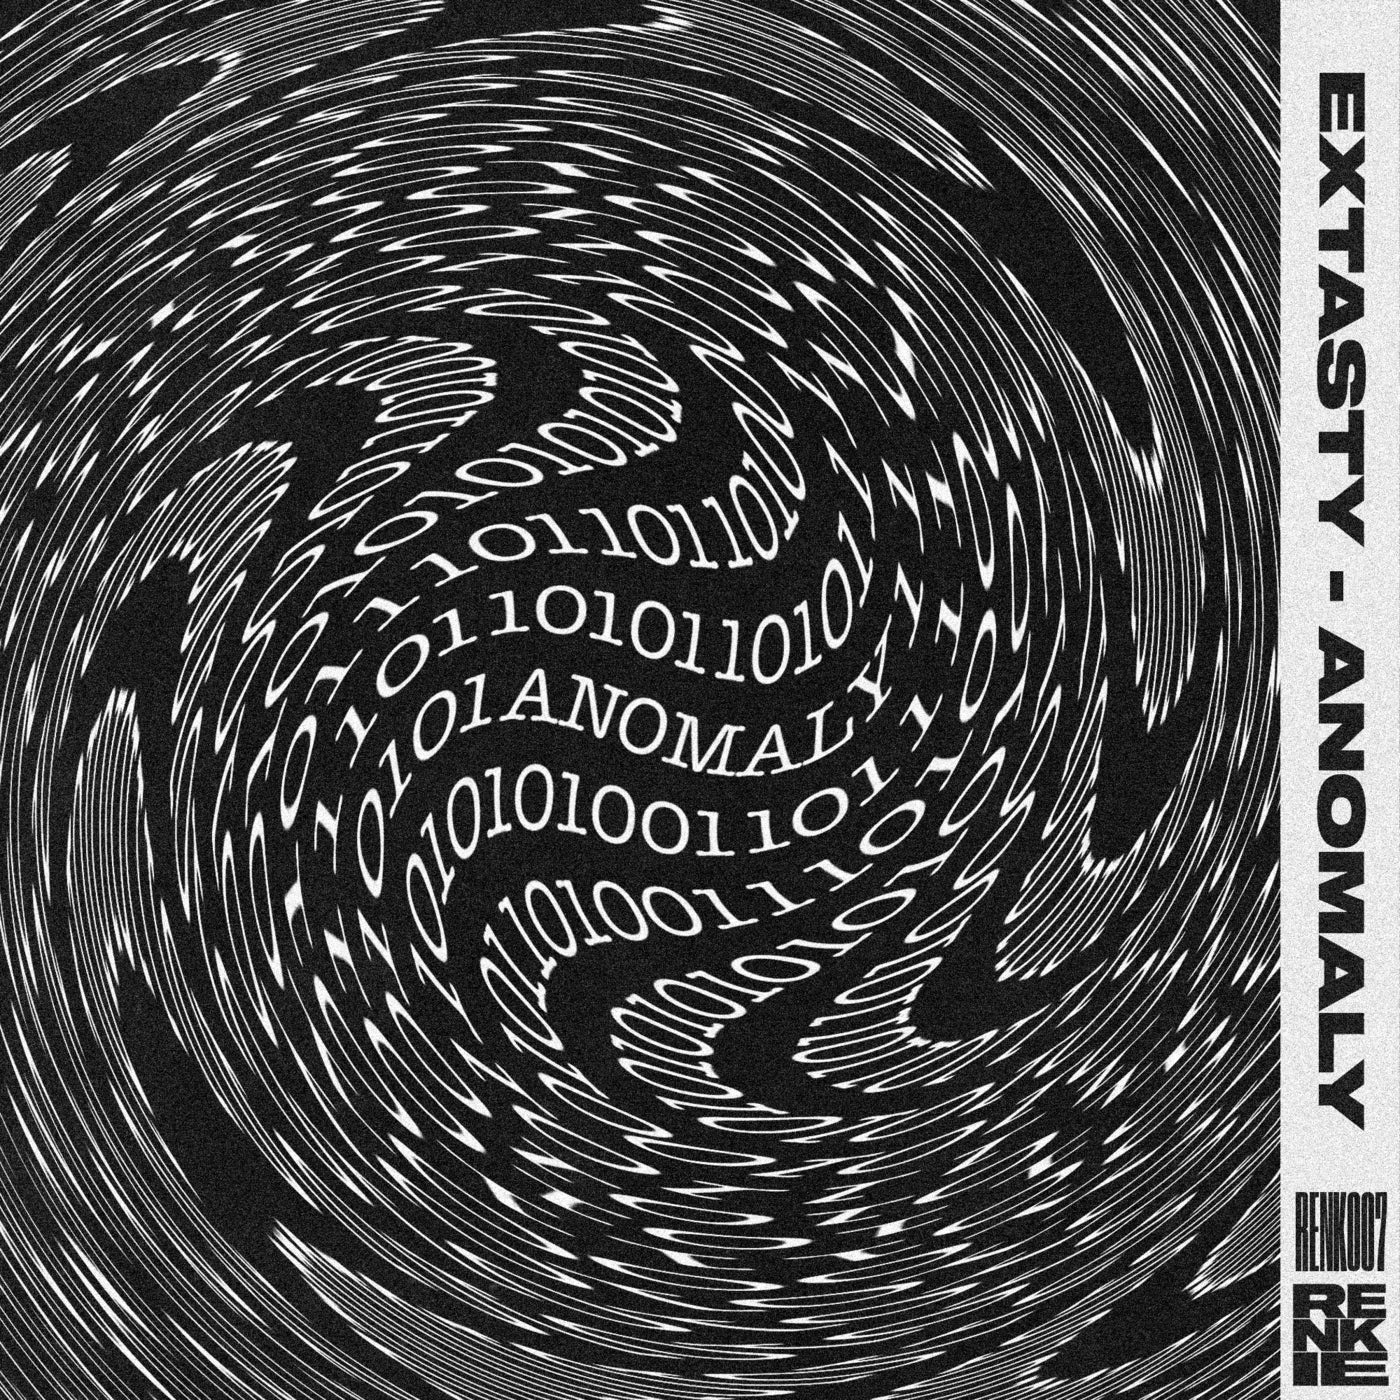 Anomaly (Original Mix)